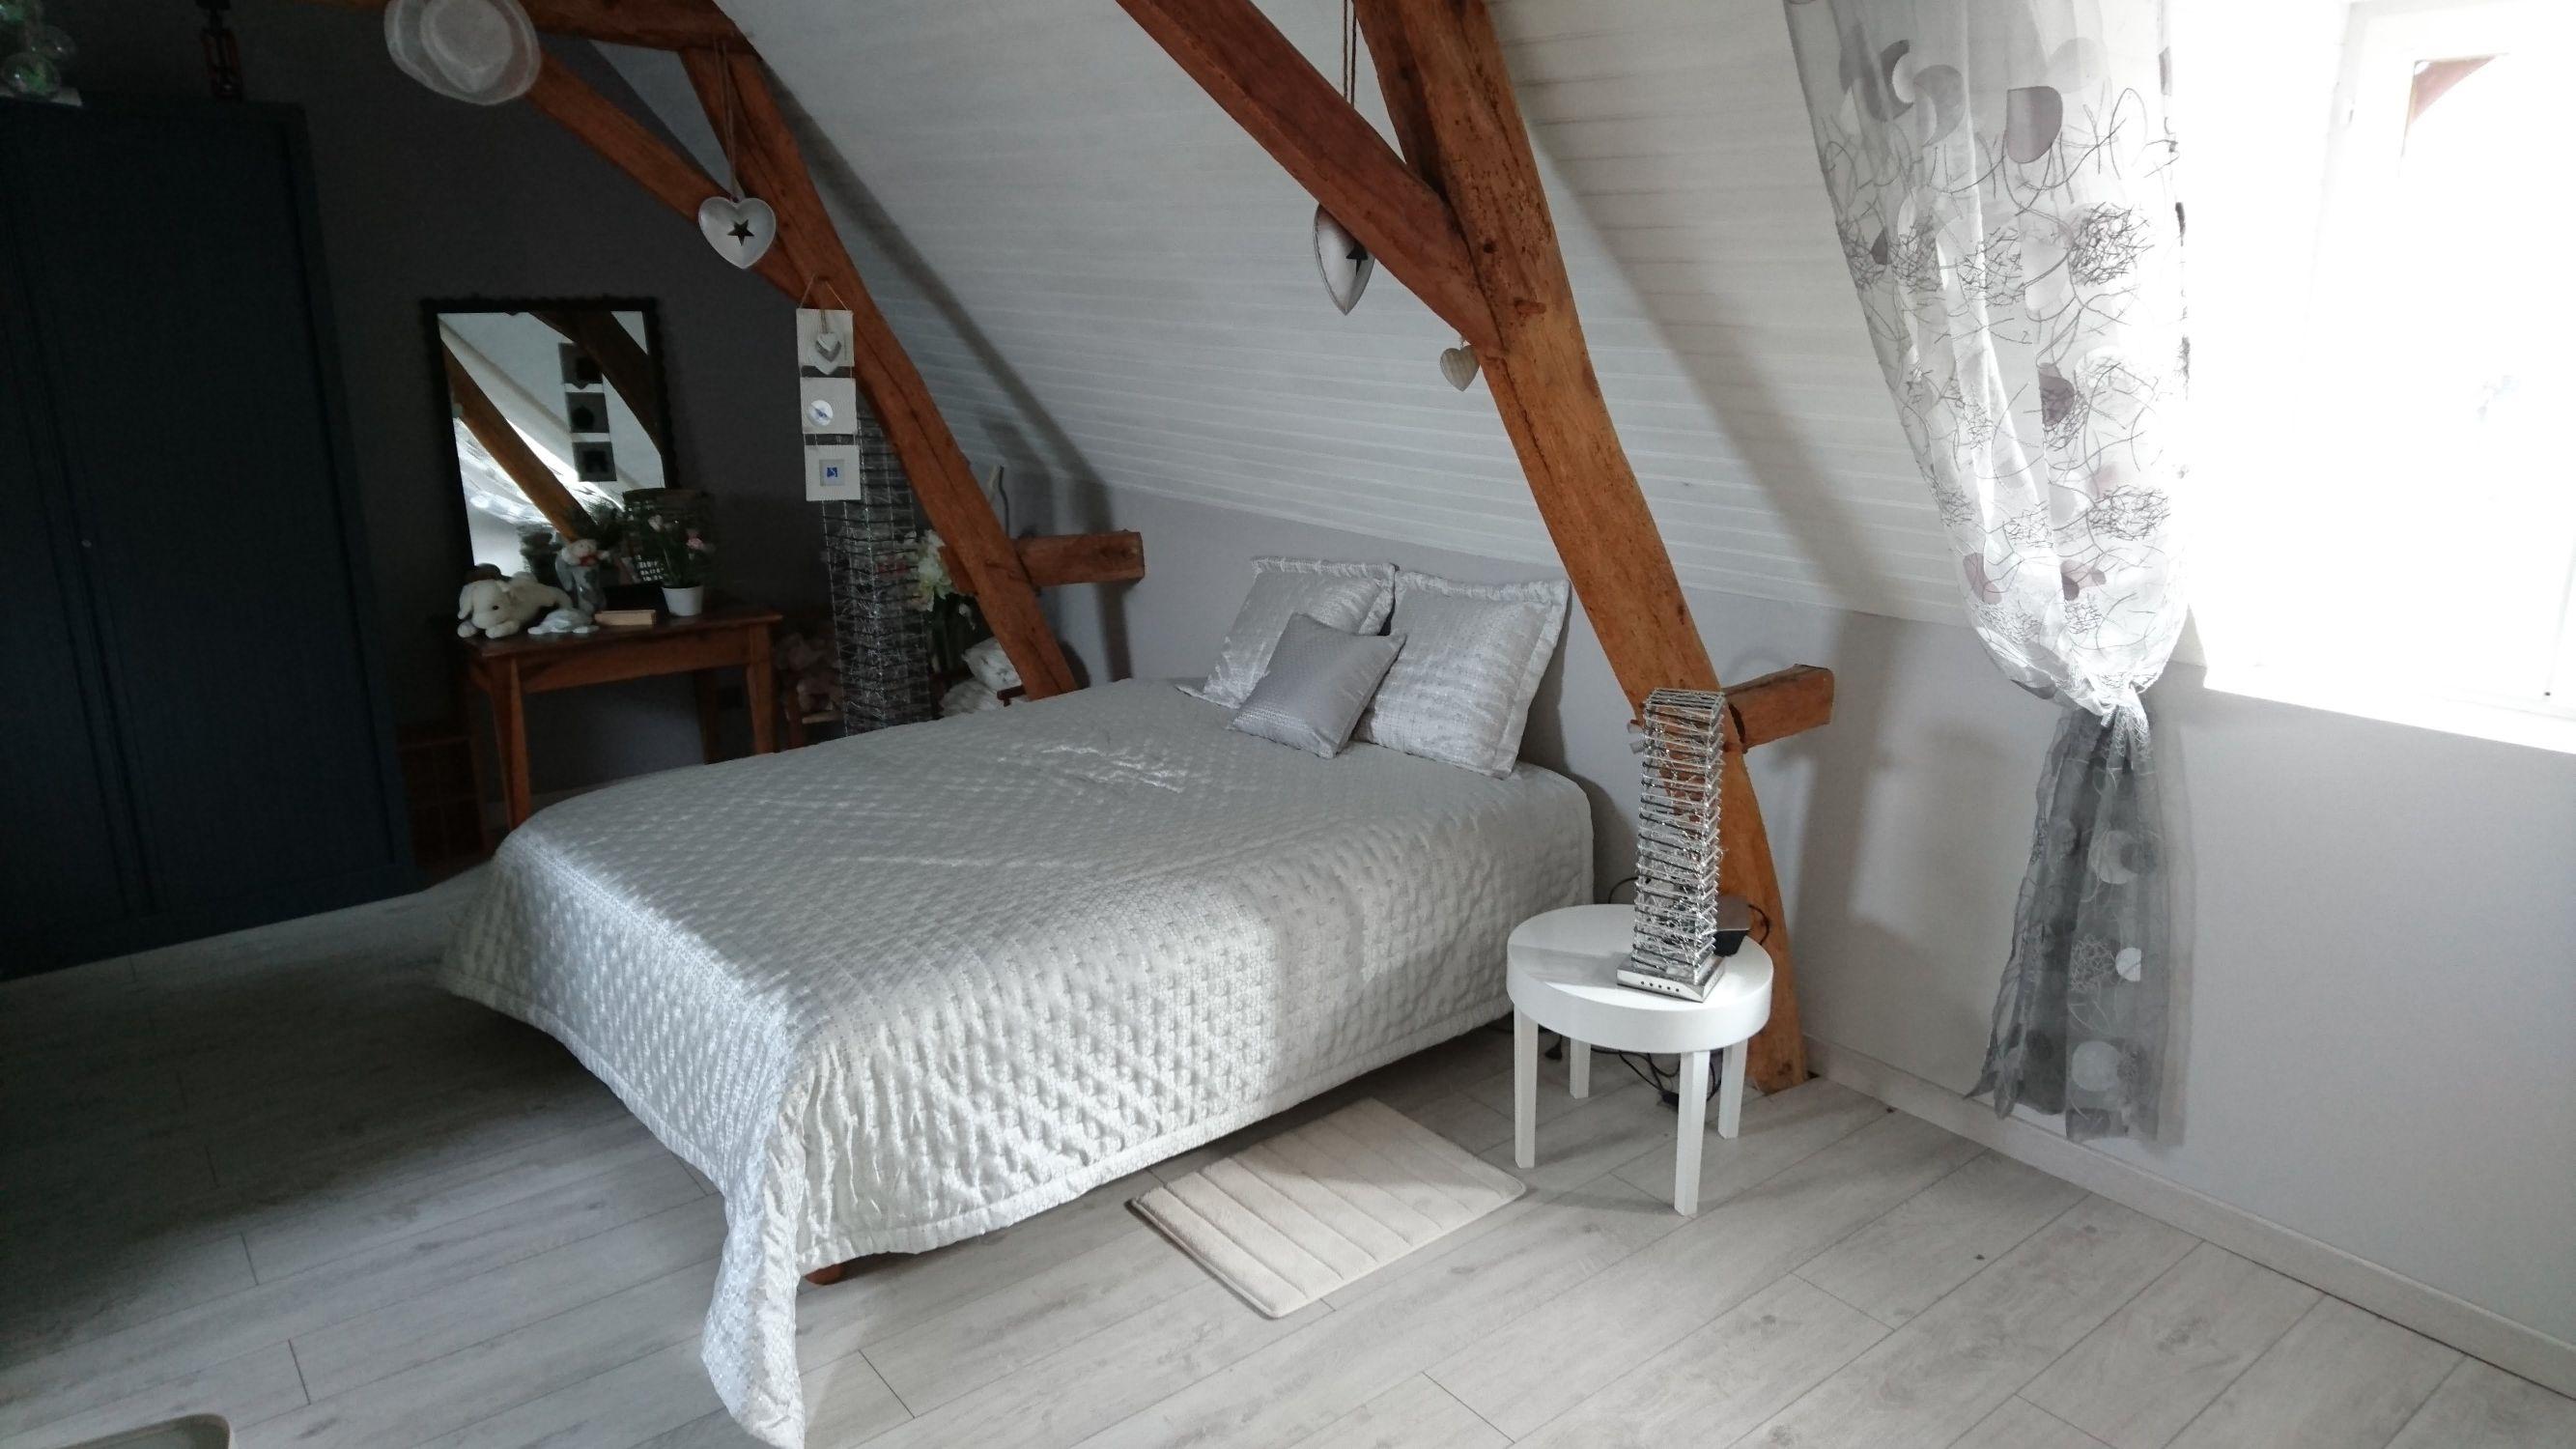 Chambre des voyageurs - Bed and breakfasts en alquiler en Saint